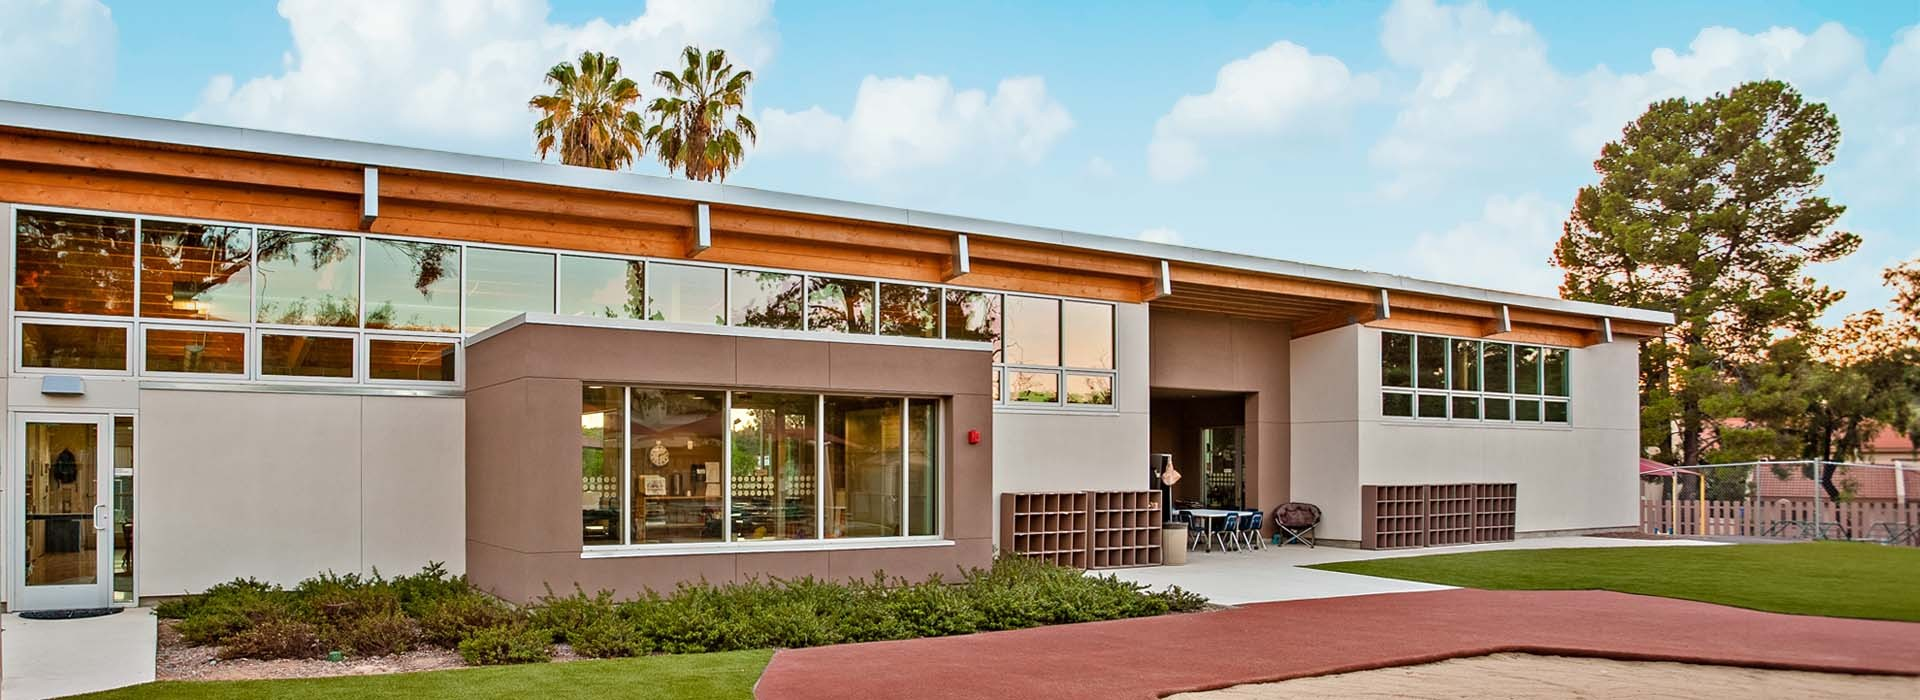 Country Montessori School   LinkedIn